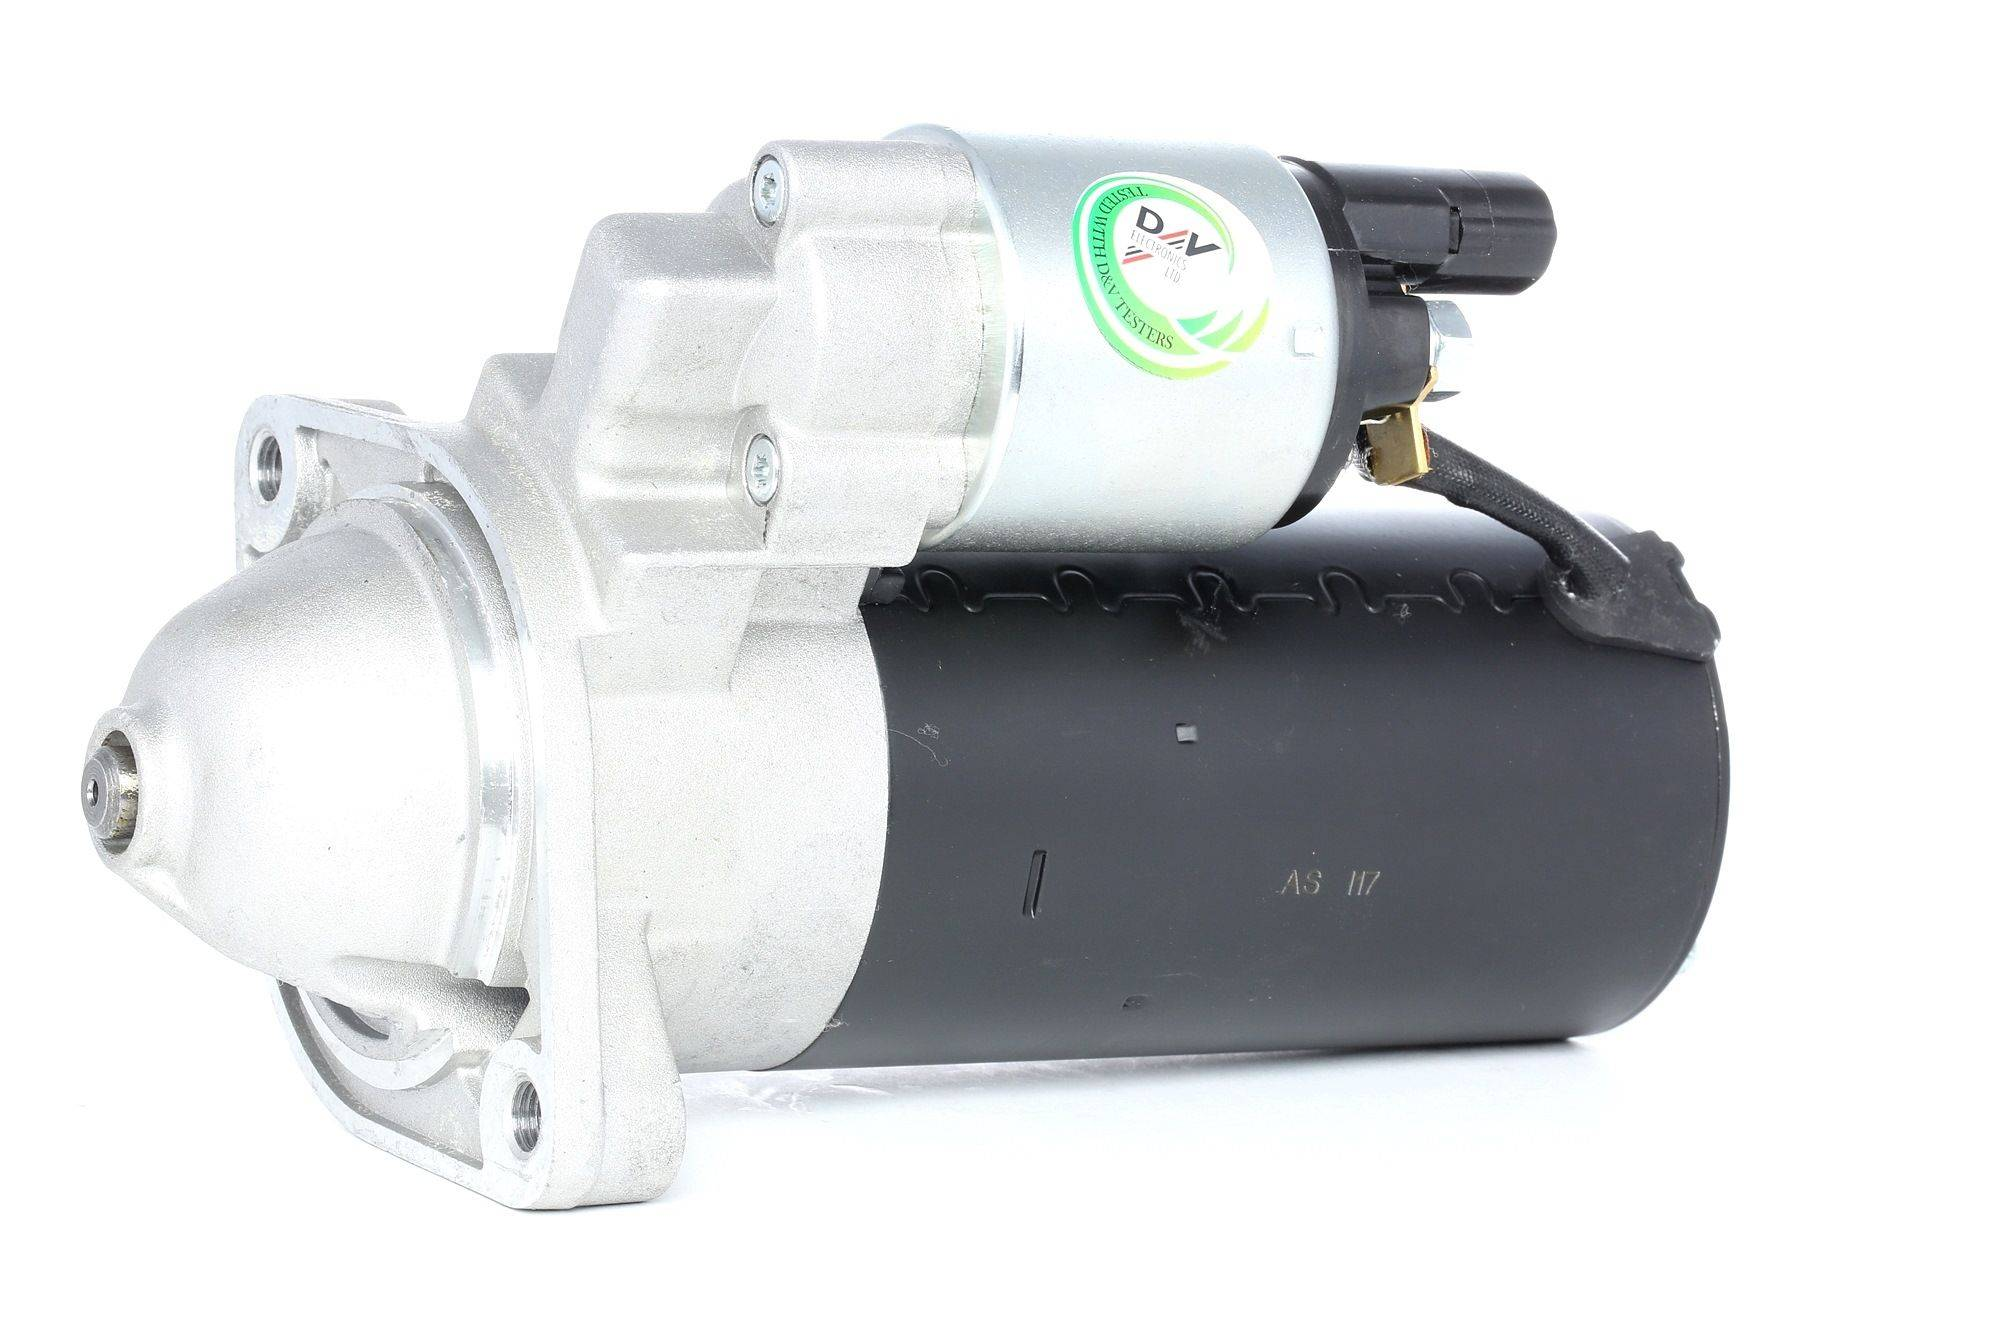 AS-PL Starttimoottori Brand new AS-PL Alternator 0123525501 S0020 Startti,Käynnistinmoottori TOYOTA,AVENSIS Kombi T25,COROLLA Verso ZER_, ZZE12_, R1_